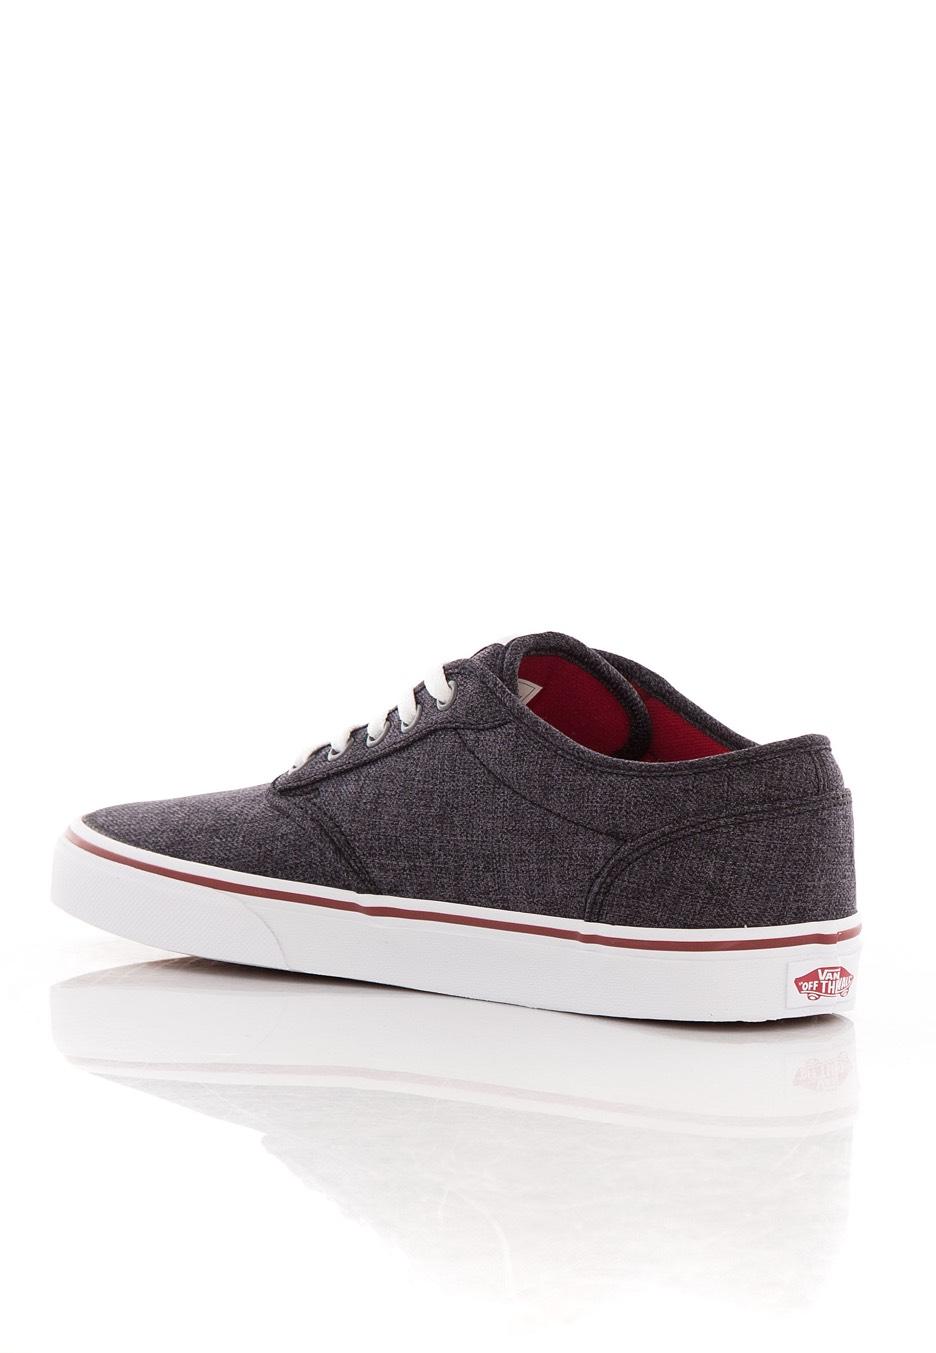 Vans - Atwood Black Red - Kengät - Impericon.com FI f209172bd30d